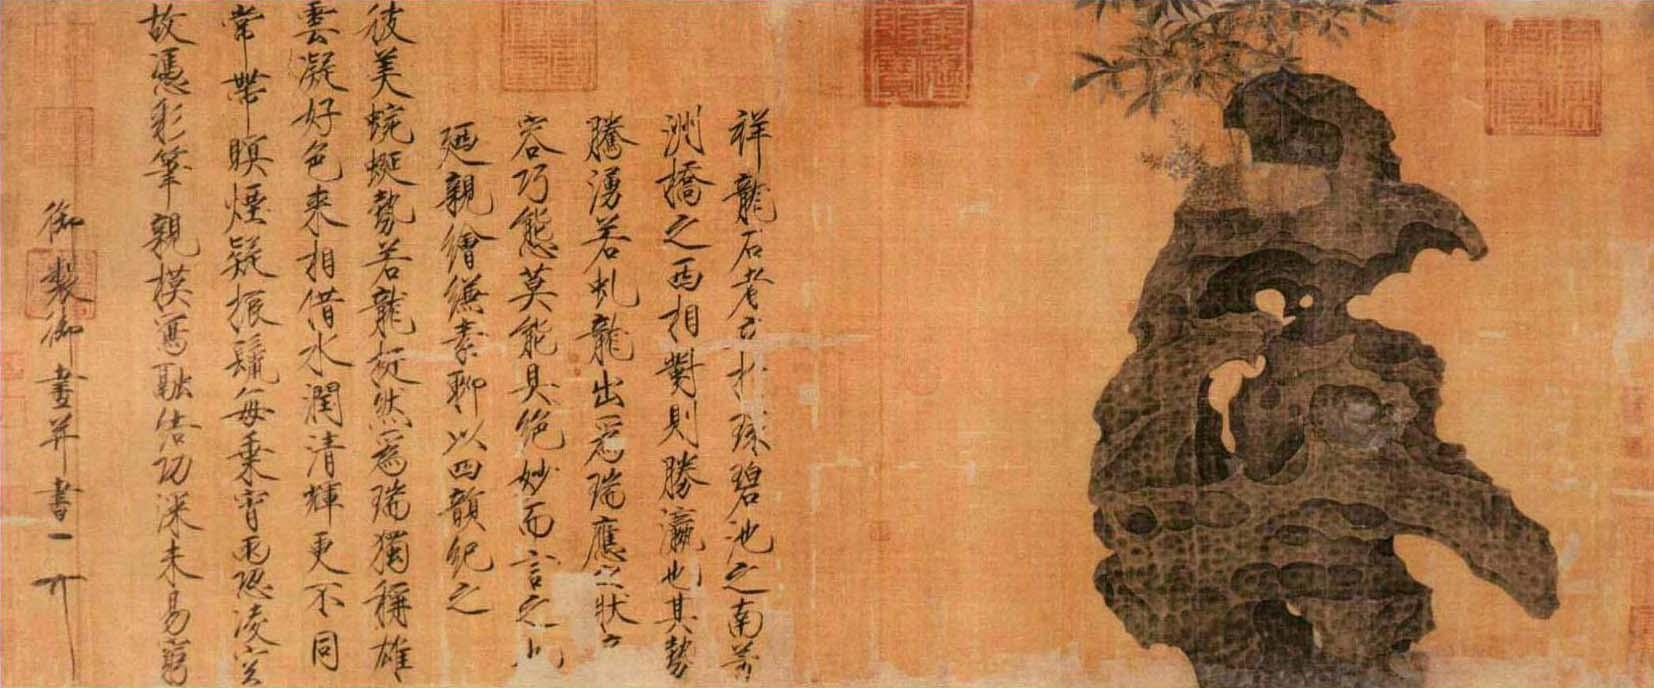 Emperor Huizong of Song - Dragon Stone